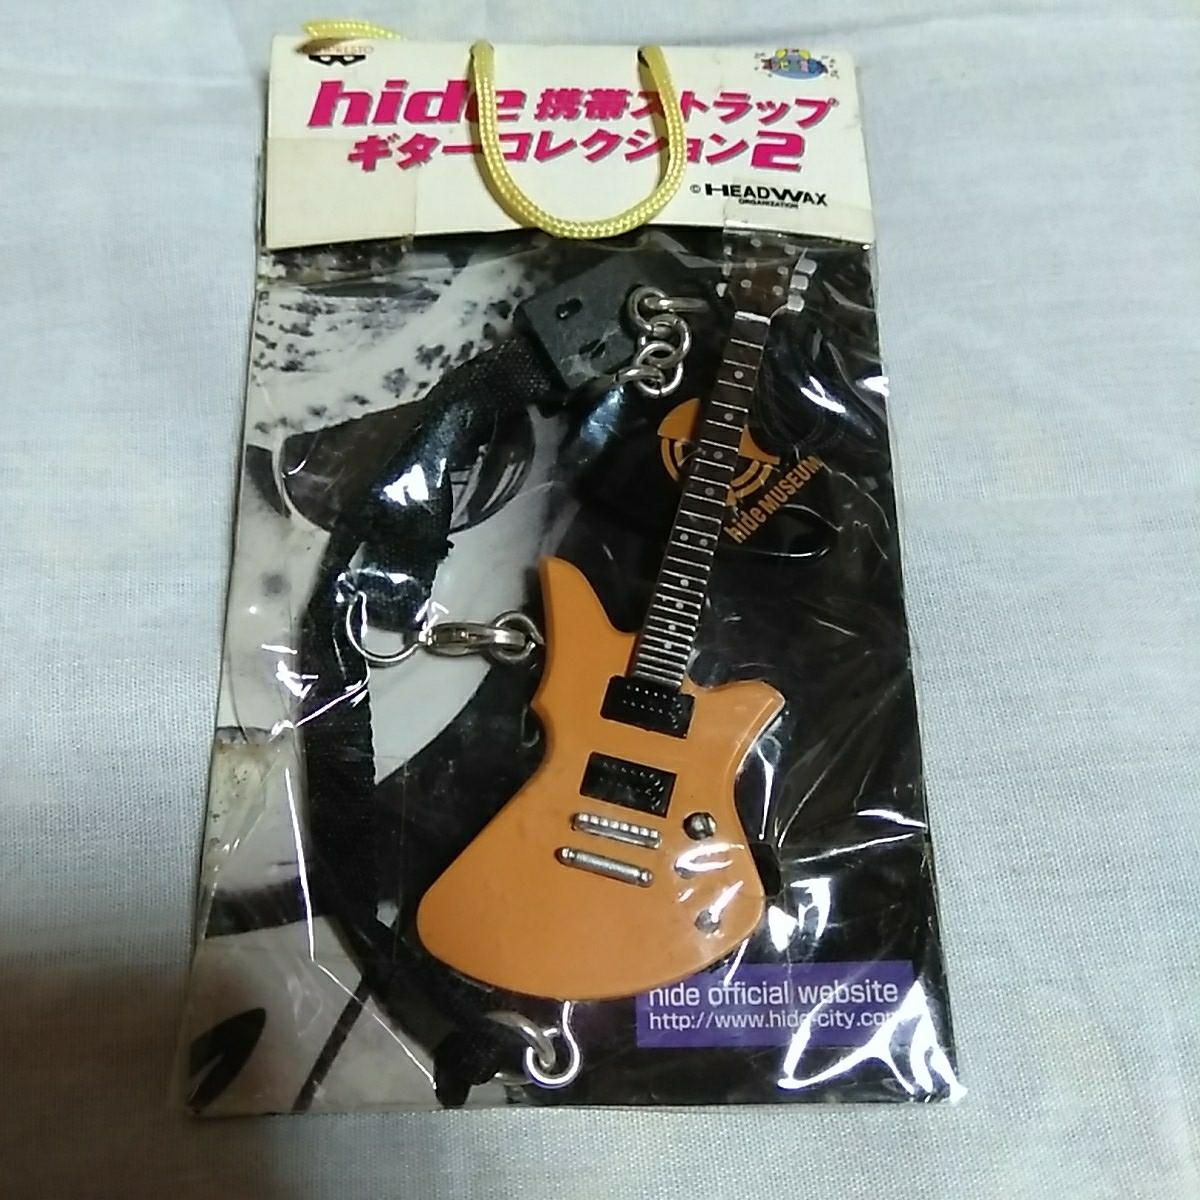 hide 携帯ストラップ ギターコレクション2_画像1